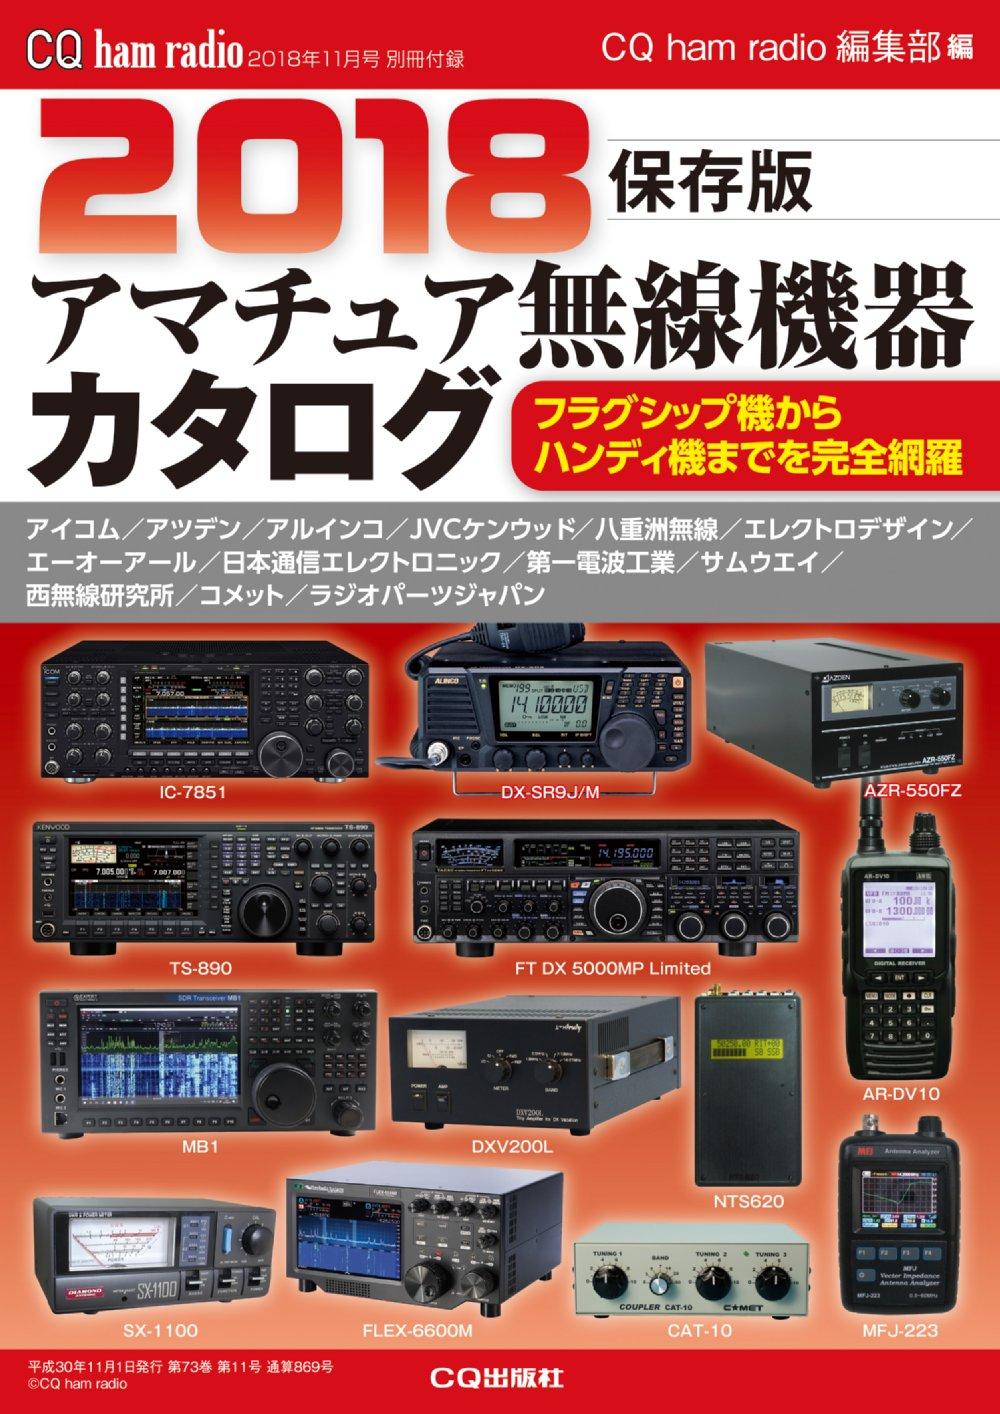 CQ ham radio 2018年11月号 別冊付録「保存版 2018アマチュア無線機器カタログ」